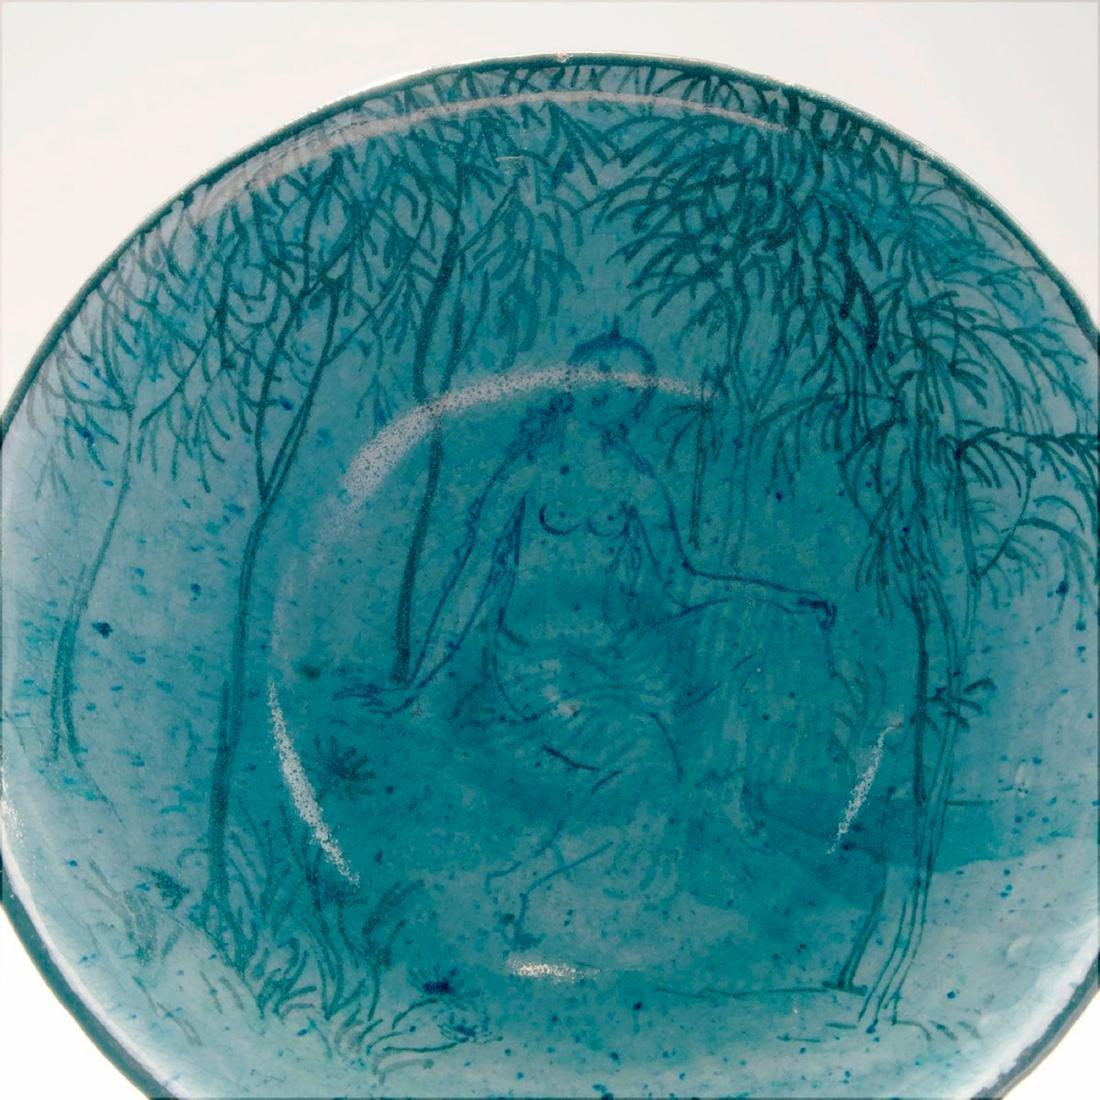 'Akt vor Ornament' bowl, 1919 - 2